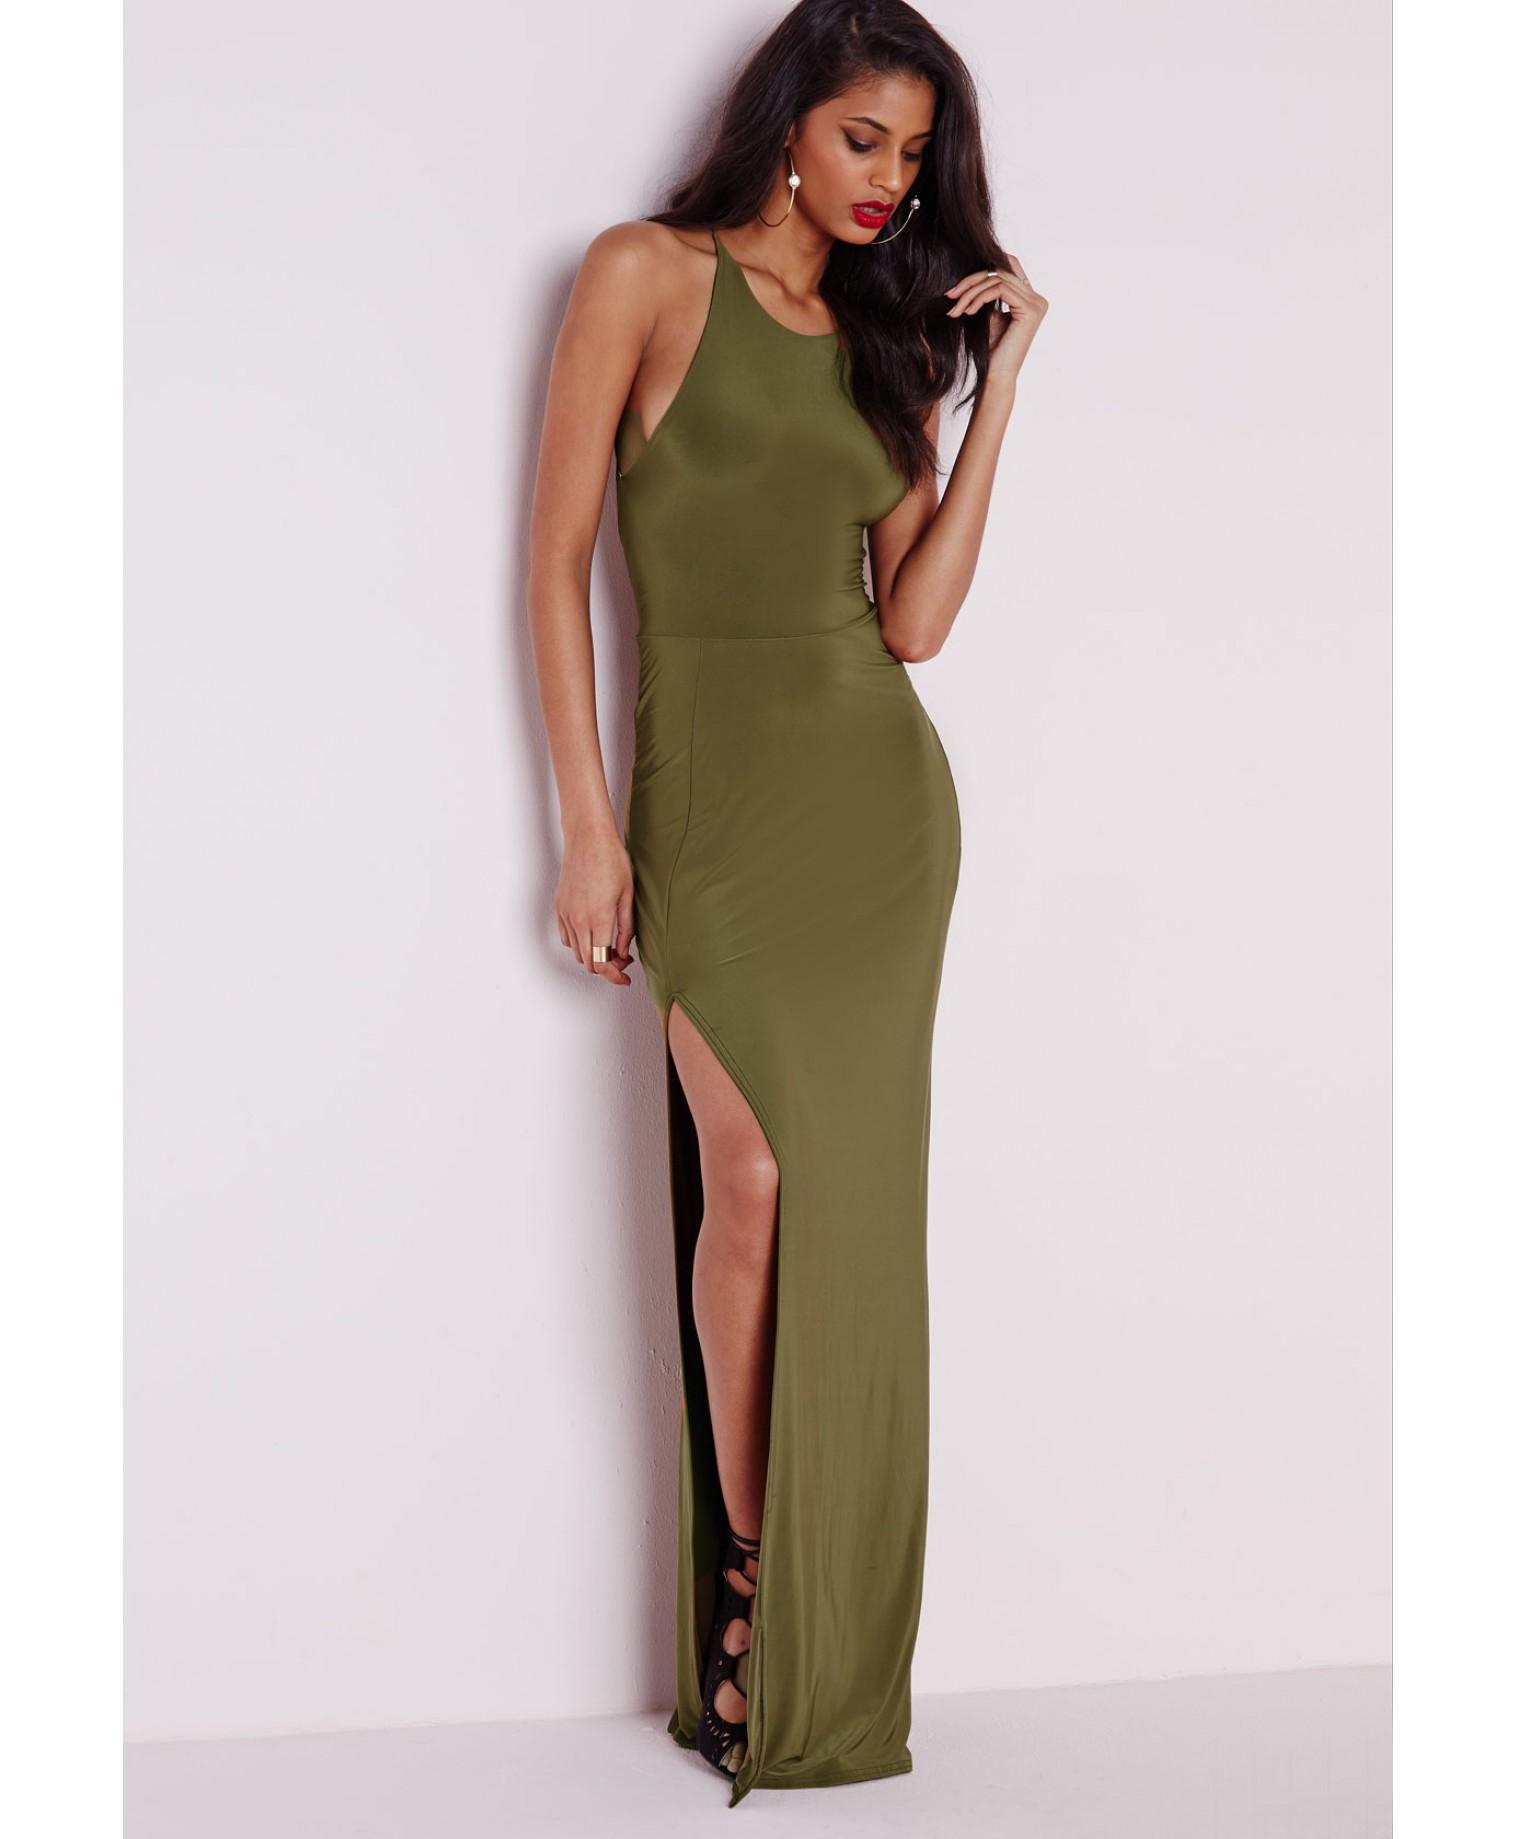 5242d16bf347 Lyst - Missguided Slinky Side Split Maxi Dress Khaki in Natural